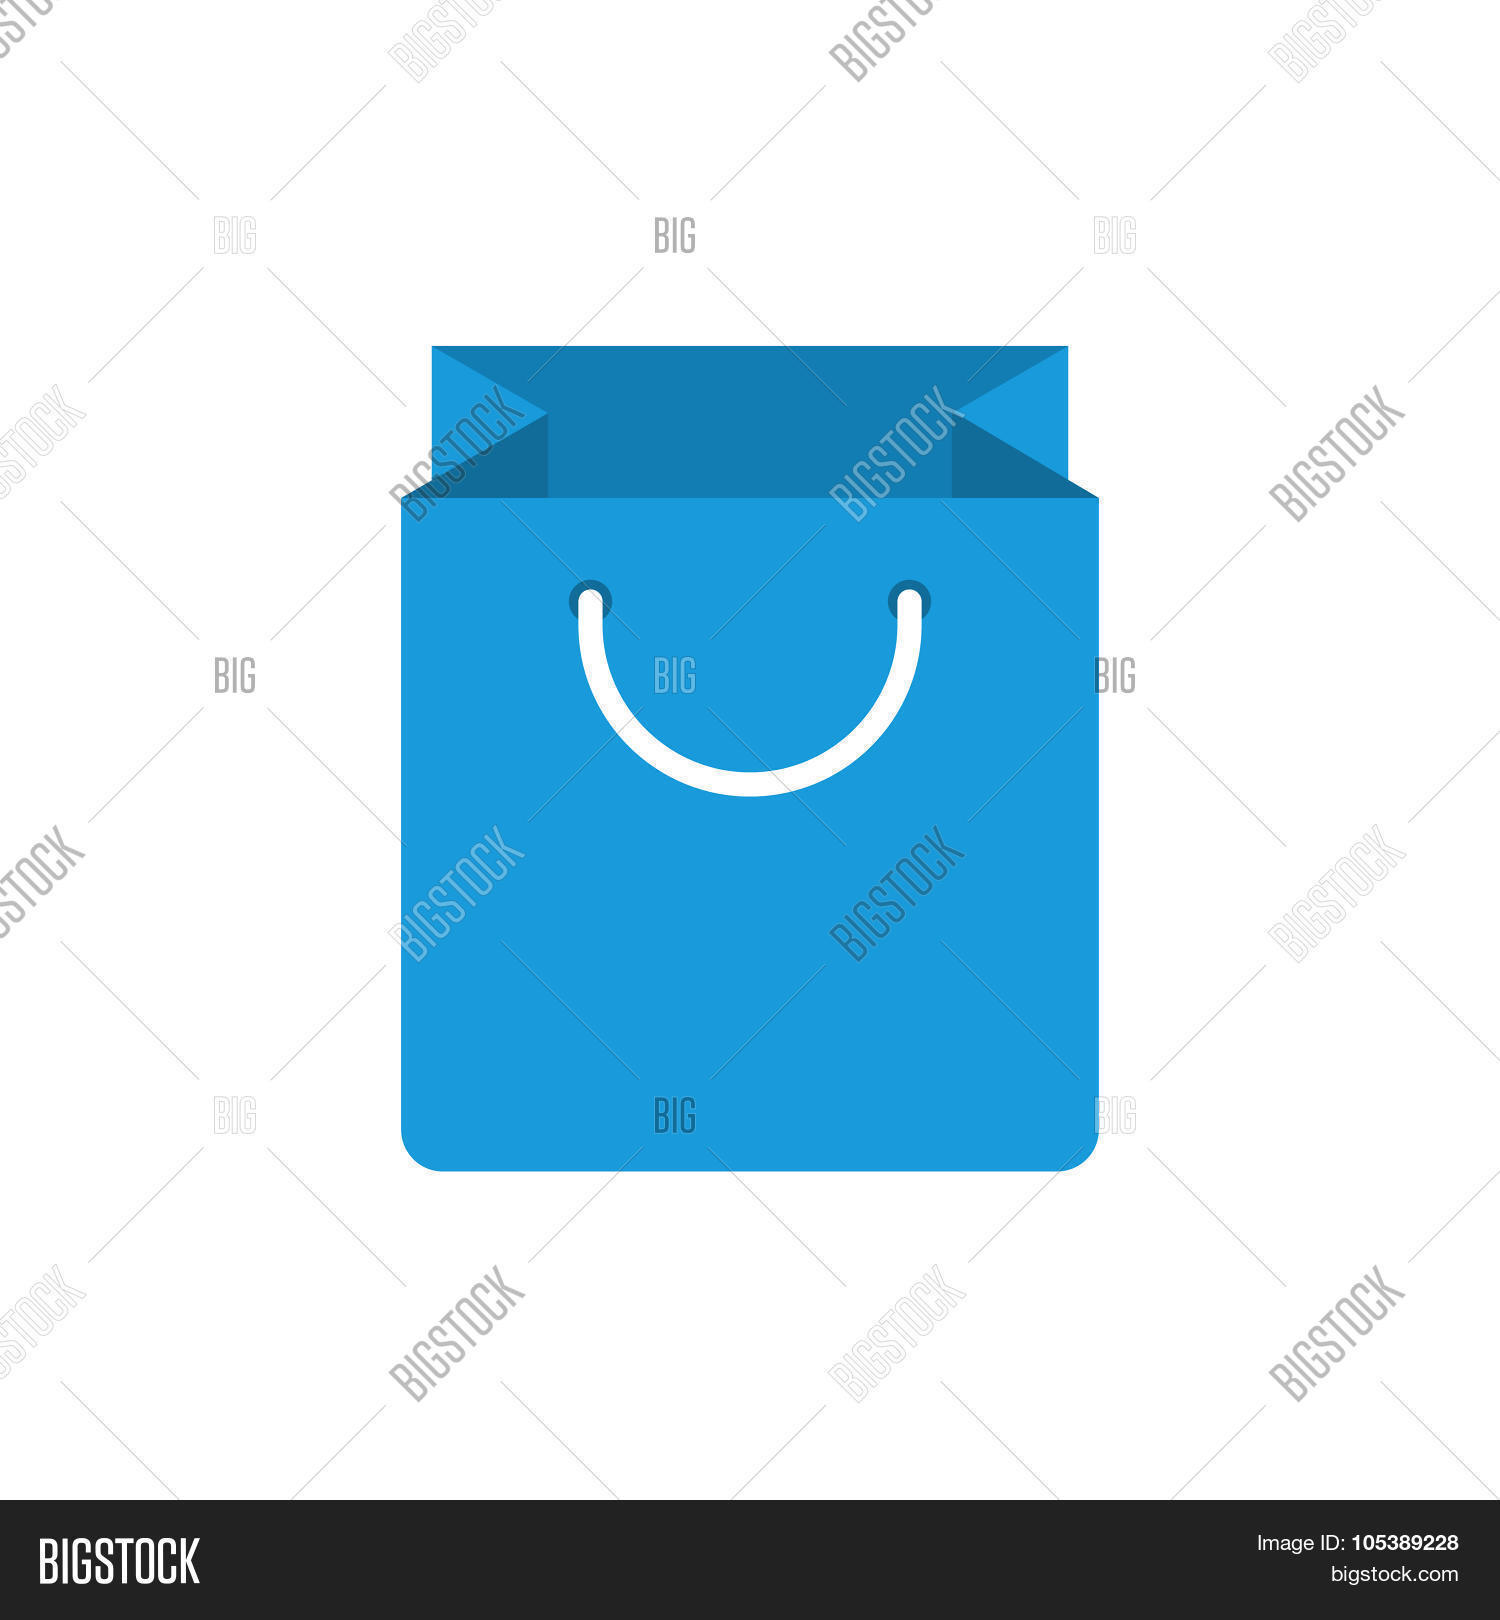 Paper bag vector - Shopping Bag Icon Modern Minimal Flat Design Style Paper Bag Vector Illustration